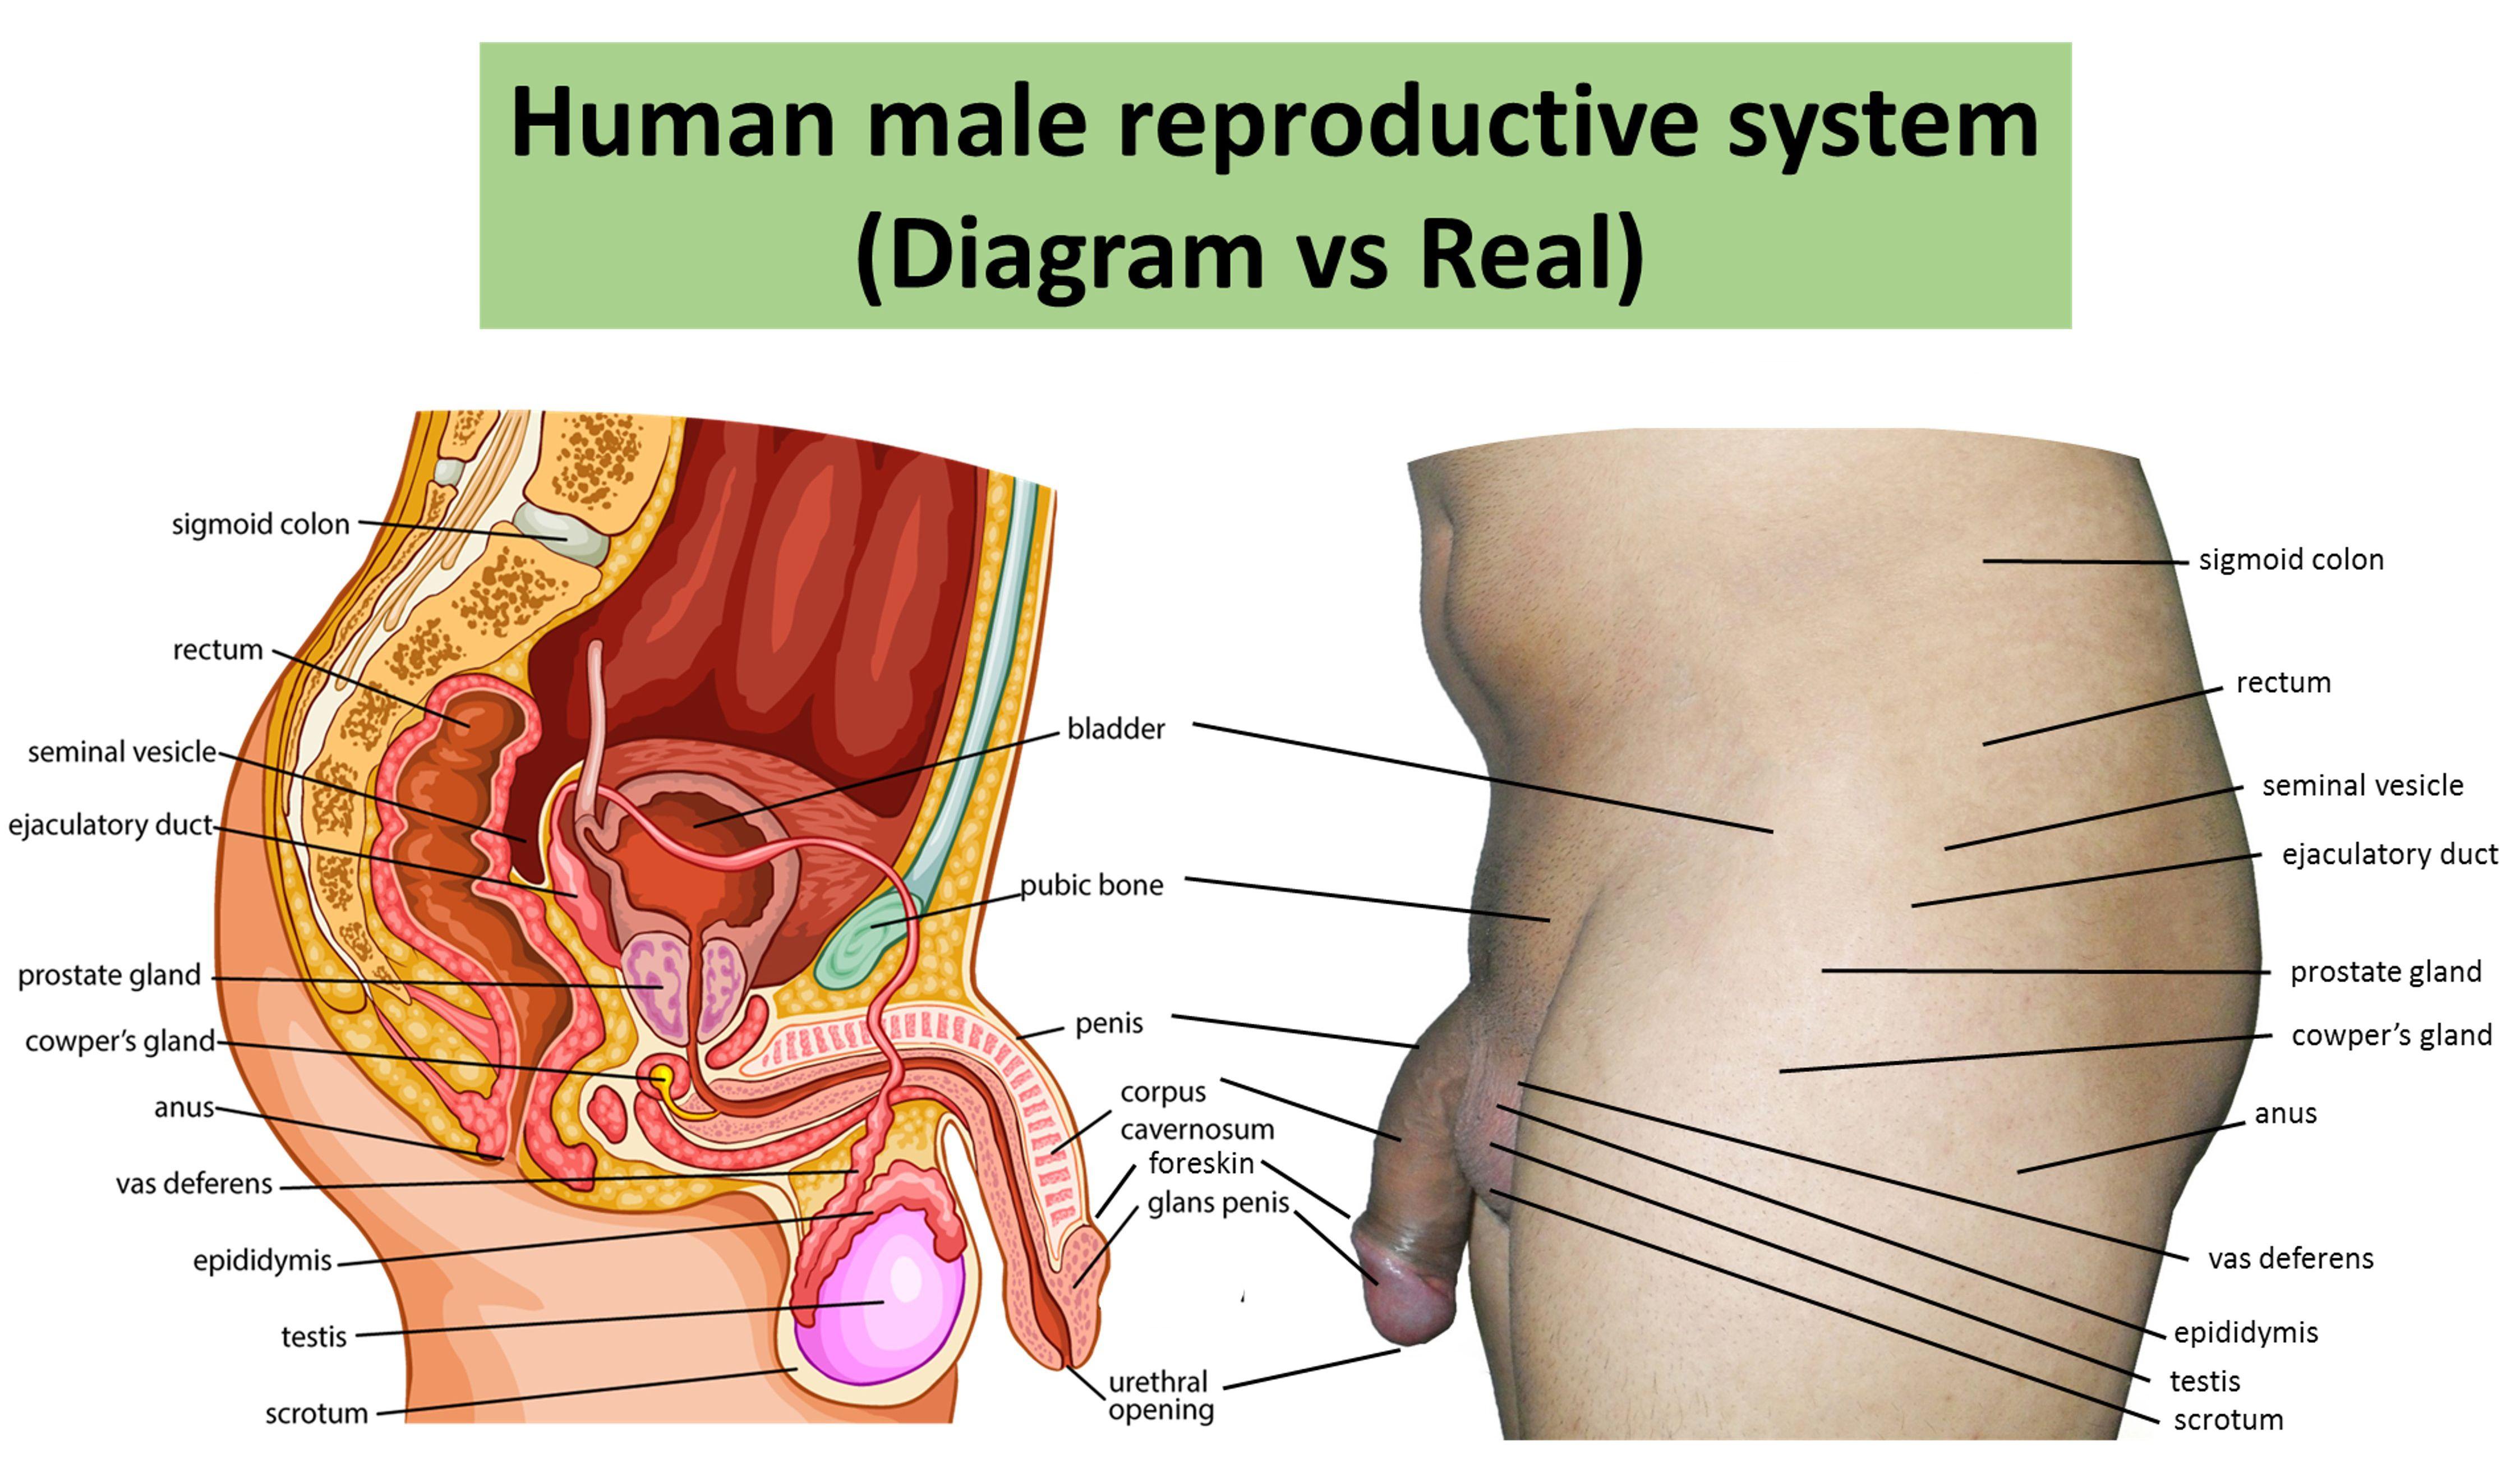 Female Reproductive System Diagram Female Reproductive System Drawing Free Download Best Female